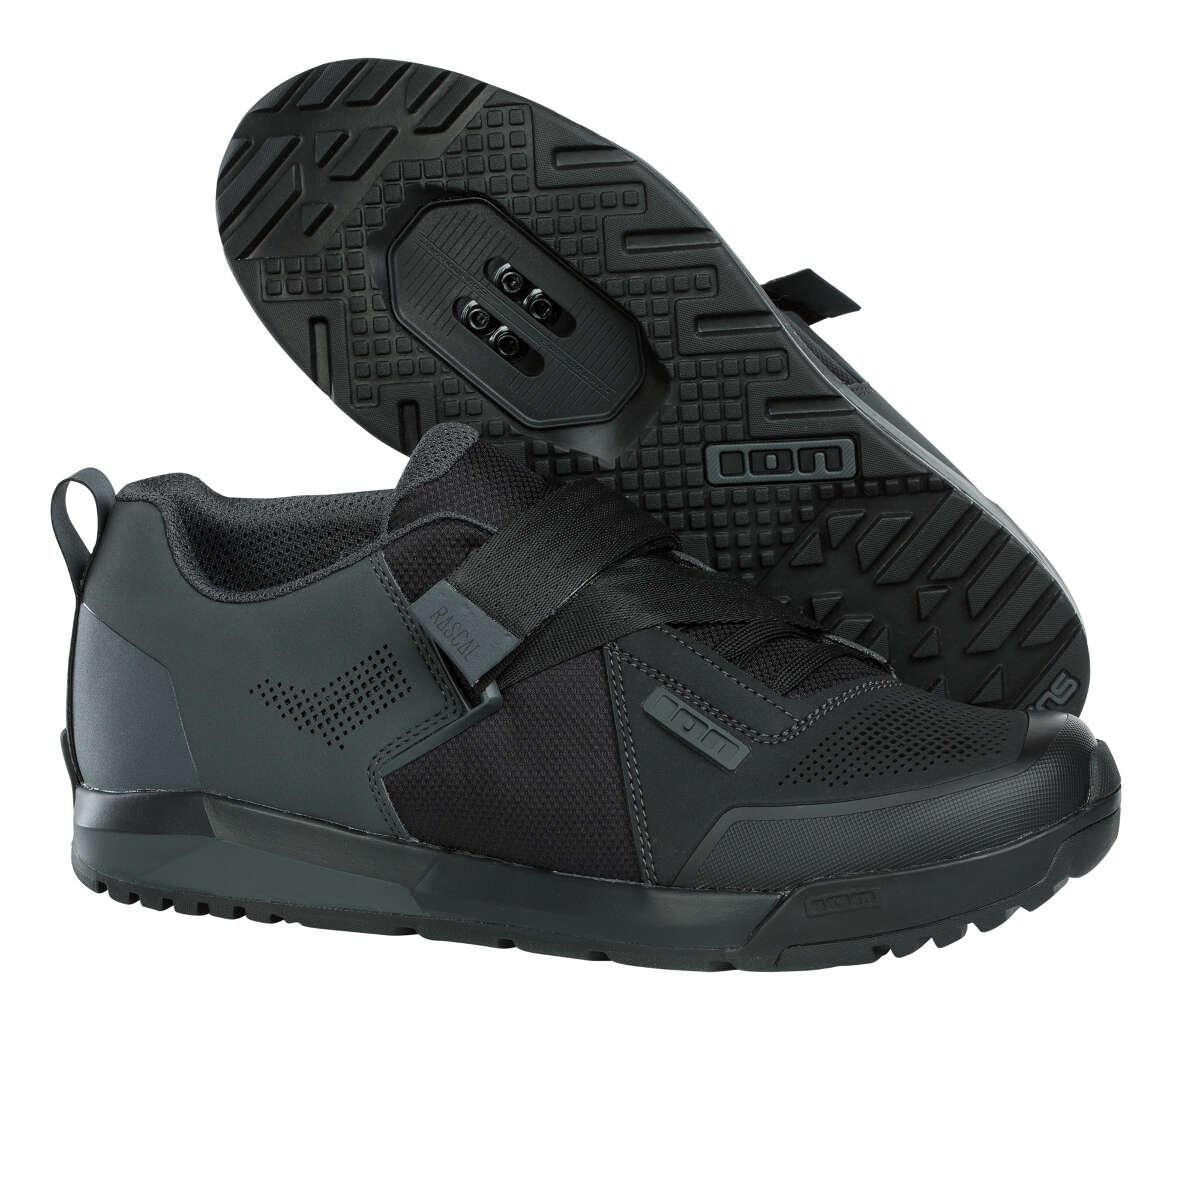 ION MTB Schuhe Rascal Schwarz